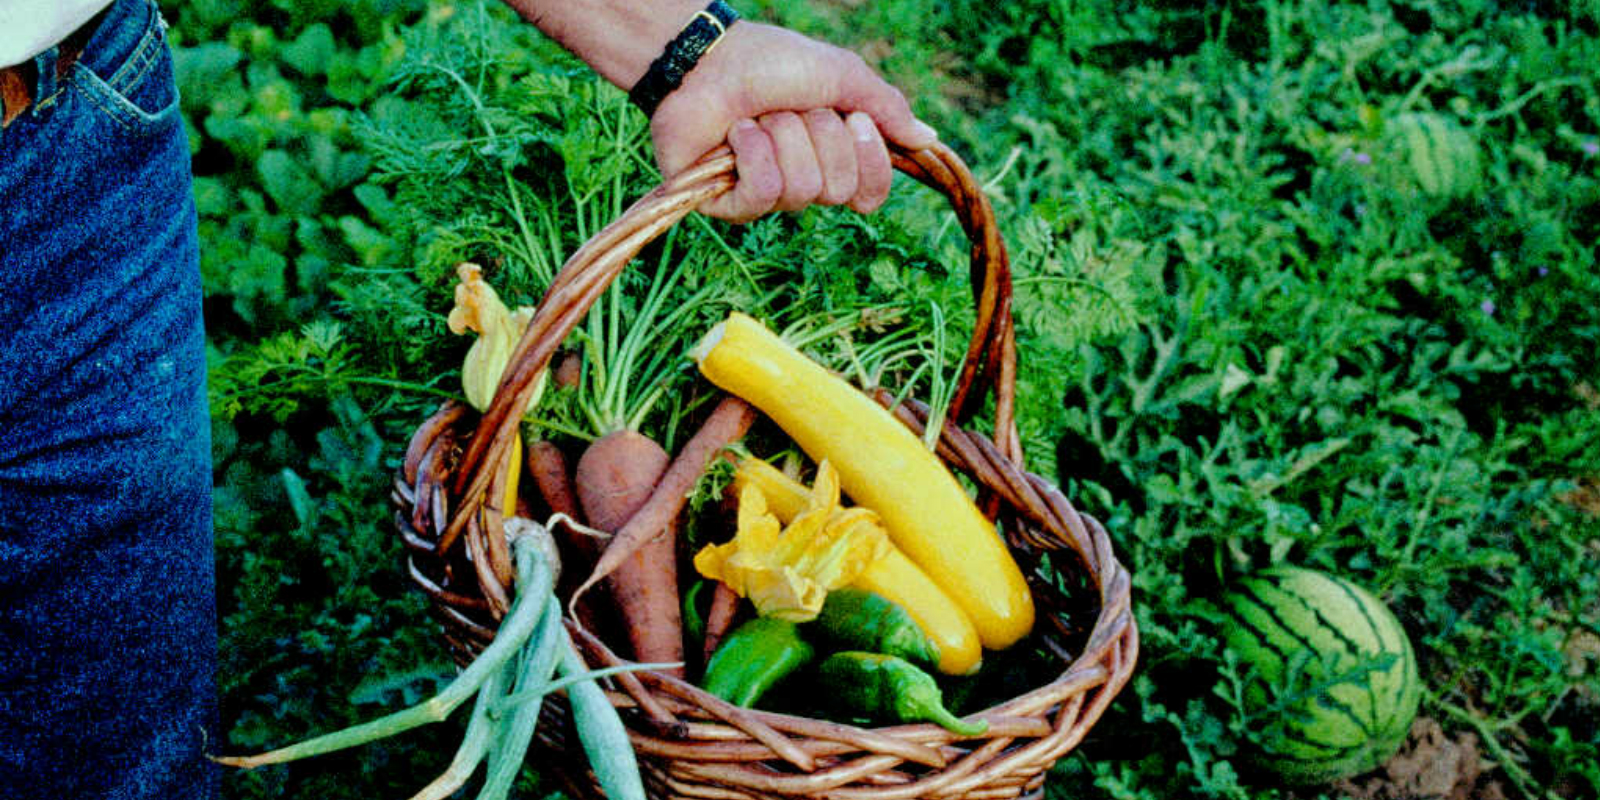 Grow Your Own Organic Garden! Sponsored by MOFGA